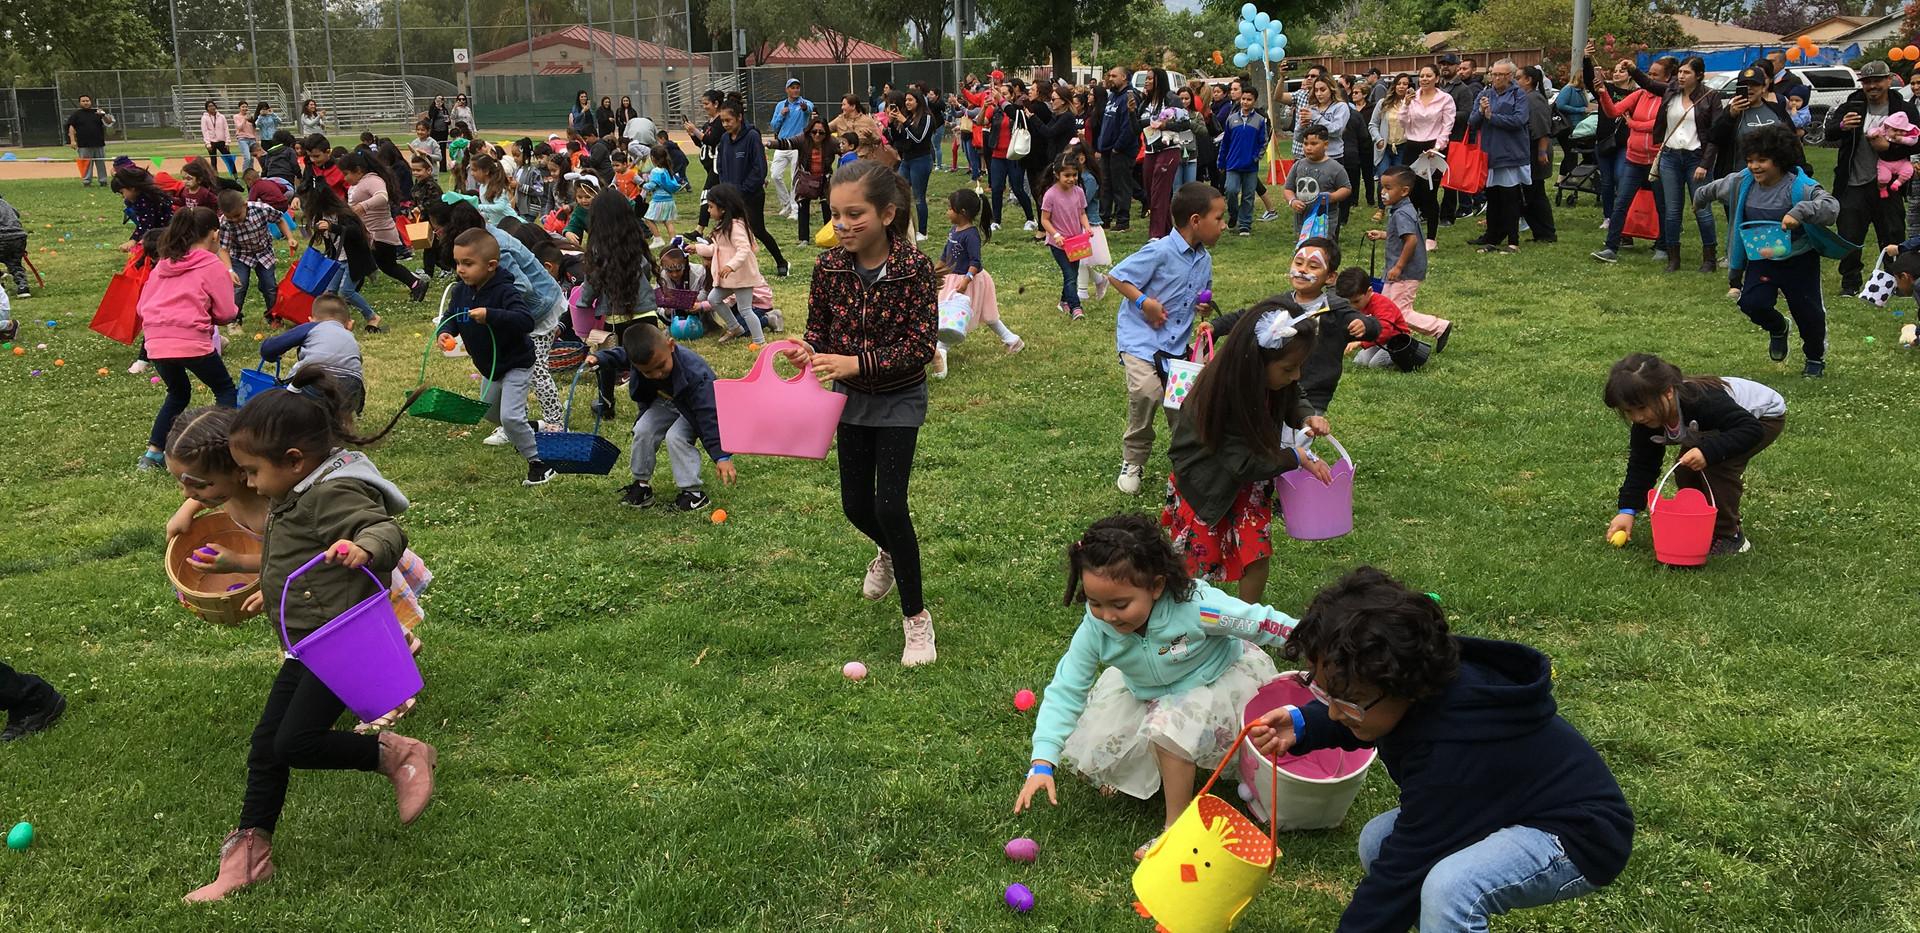 Easter Egg Hunt at Las Palmas Park 2019